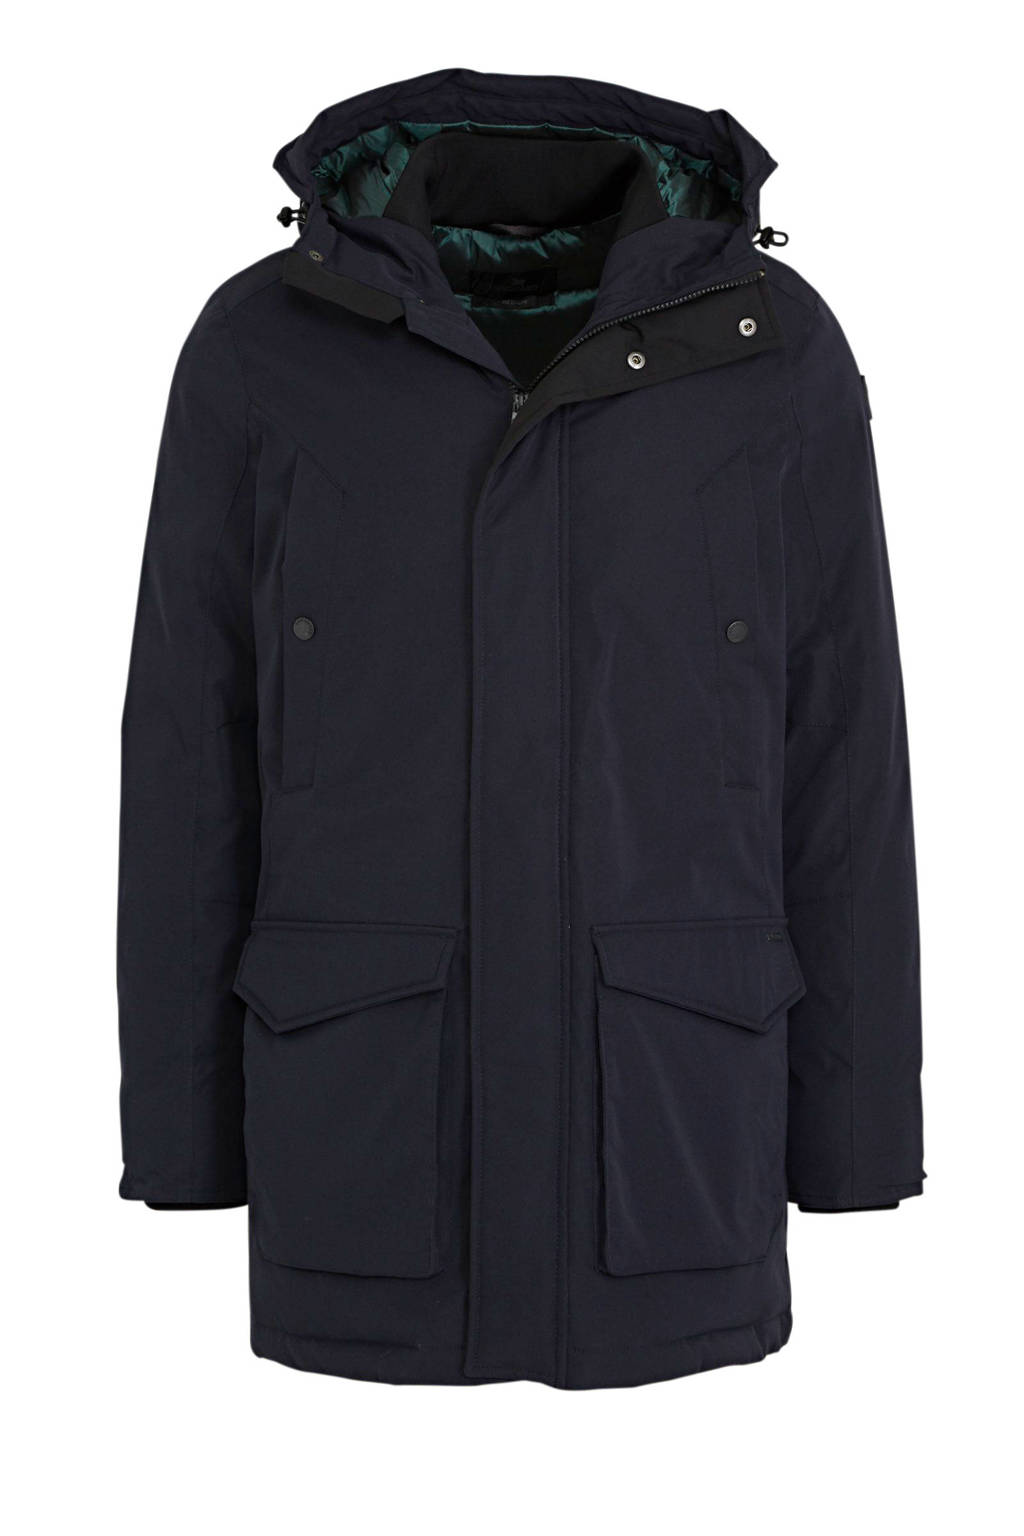 Vanguard parka winterjas donkerblauw, Donkerblauw